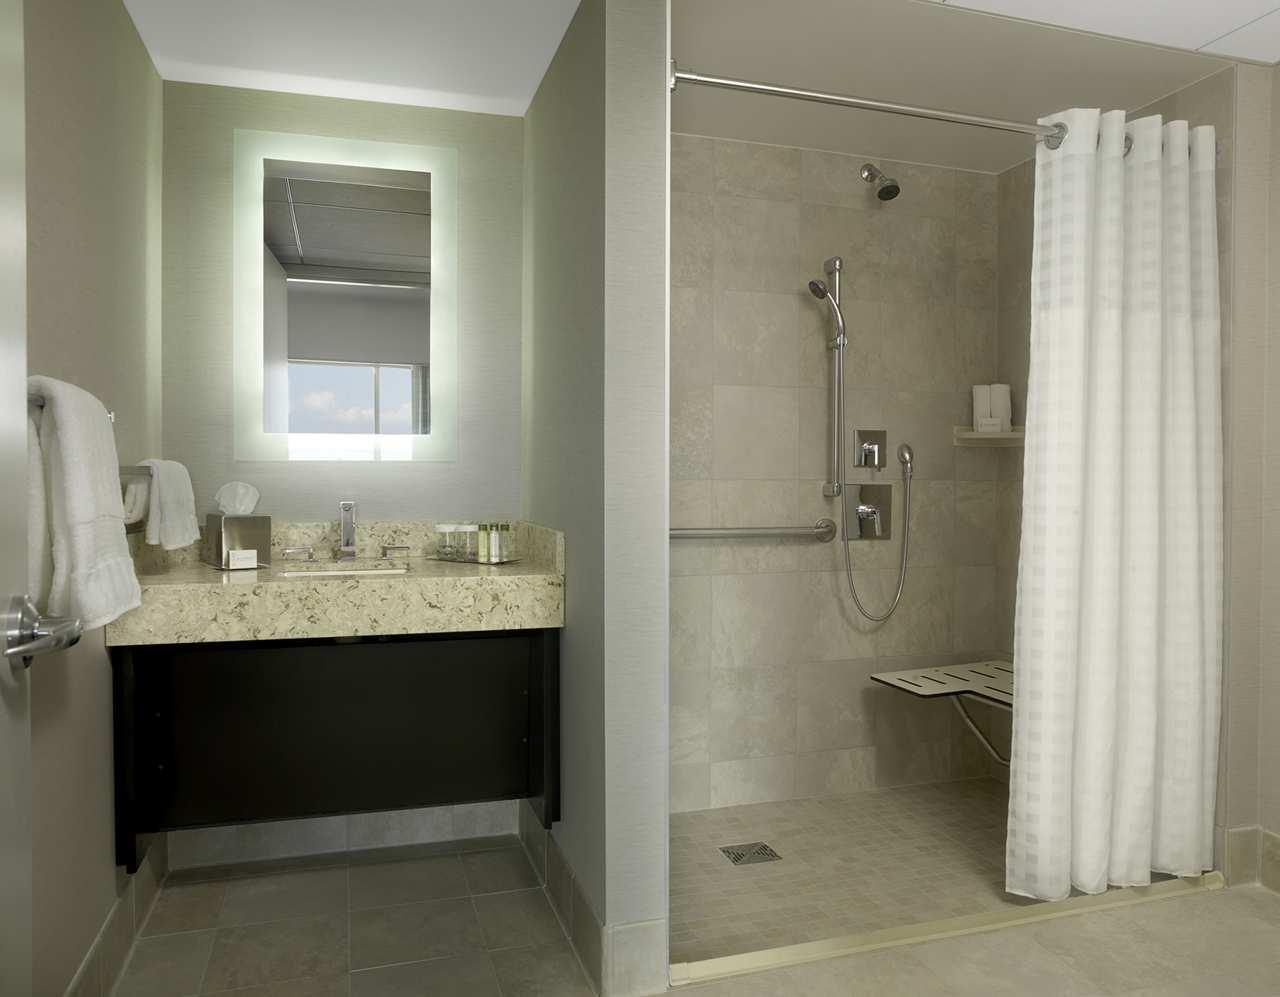 DoubleTree by Hilton Hotel Cedar Rapids Convention Complex image 14